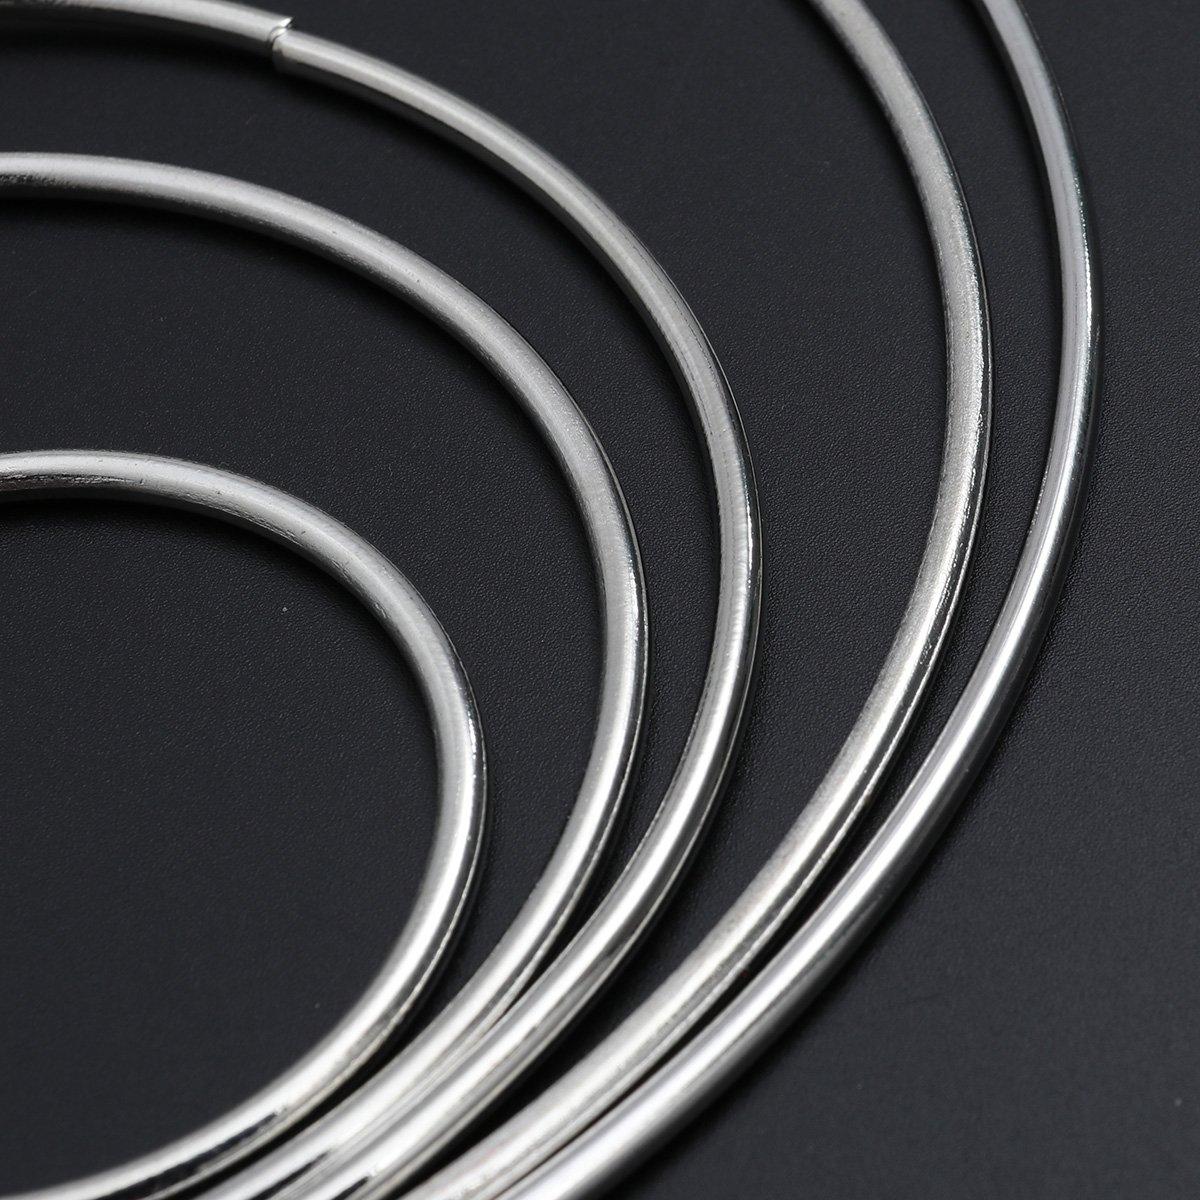 plata ULTNICE 10/pcs multi-taille Dreamcatcher redondo plata Metal anillo anillo para DIY artesan/ía dise/ño de la casa